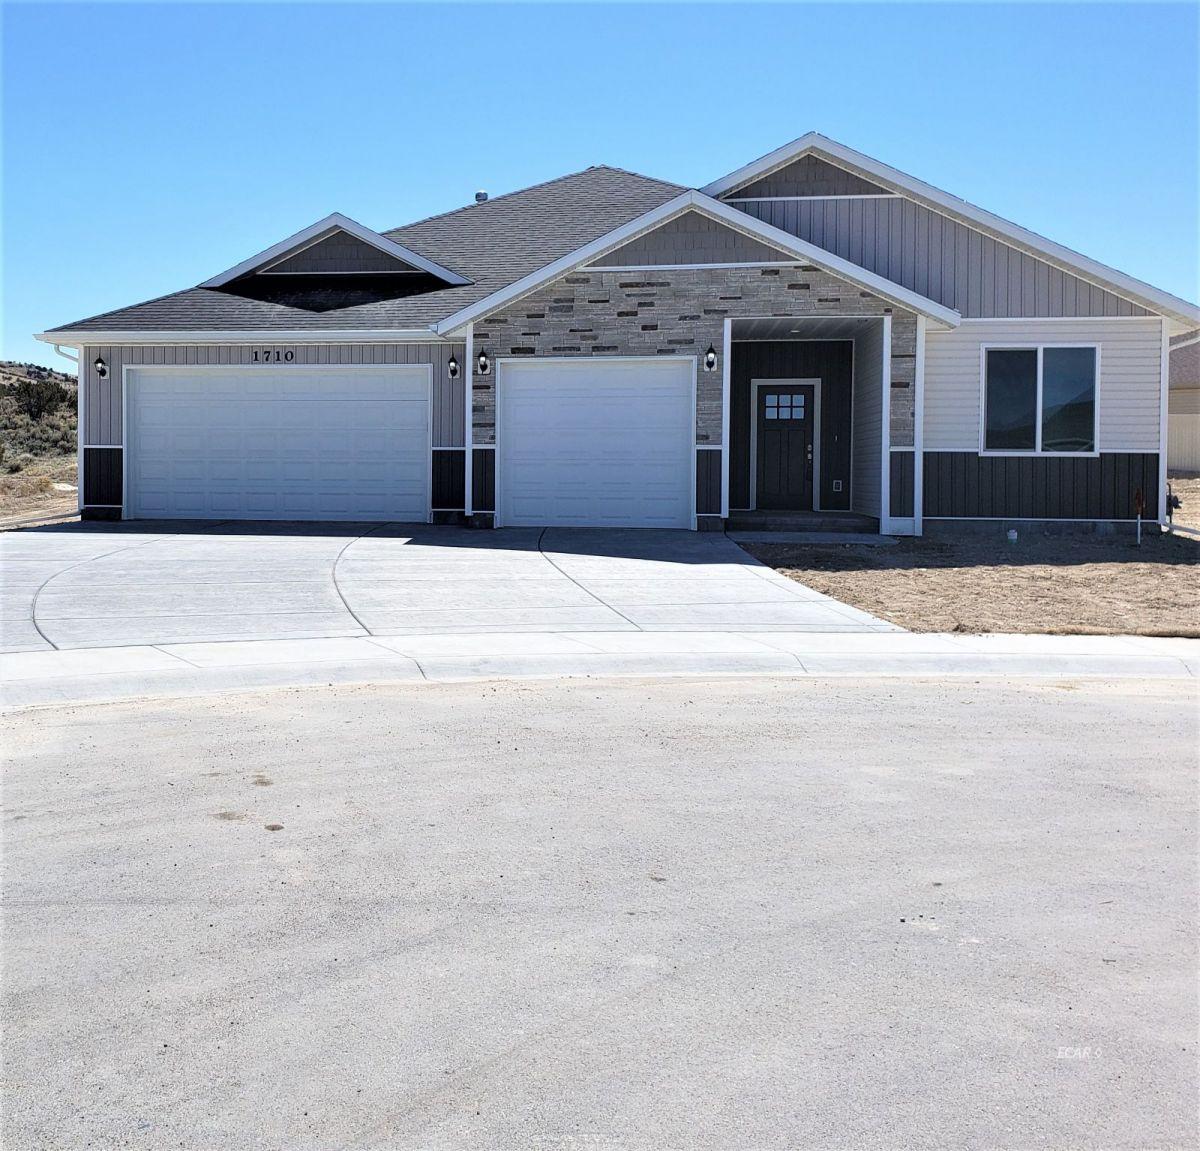 Lot 309 Deerfield Way Property Photo - Elko, NV real estate listing